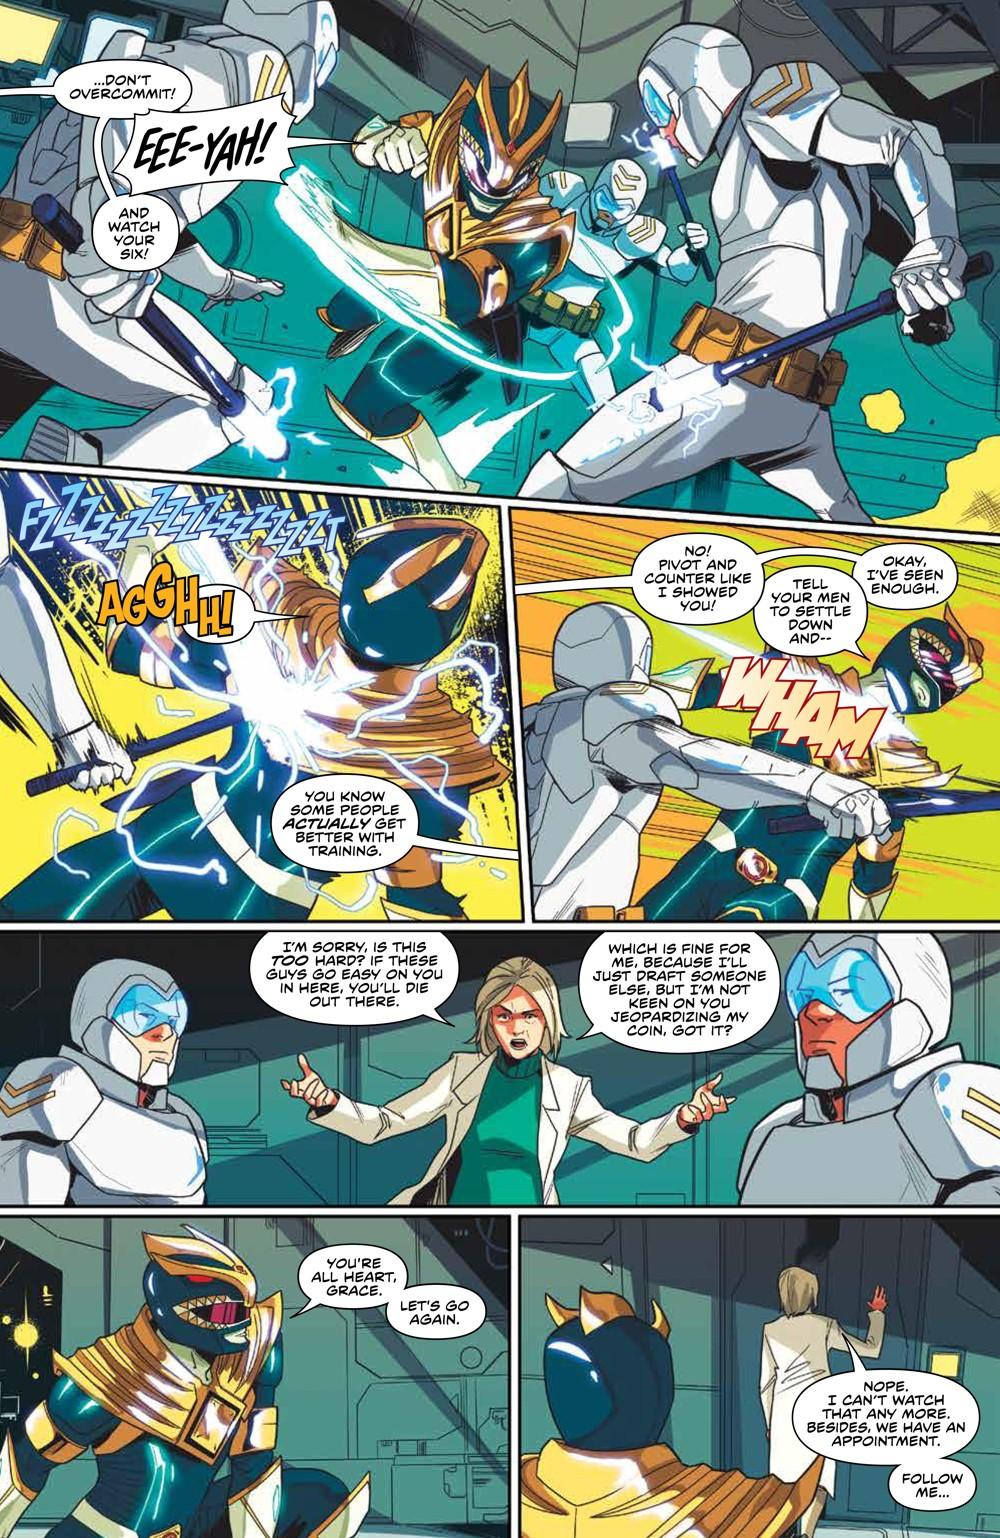 MightyMorphin_v2_SC_PRESS_18 ComicList Previews: MIGHTY MORPHIN VOLUME 2 TP